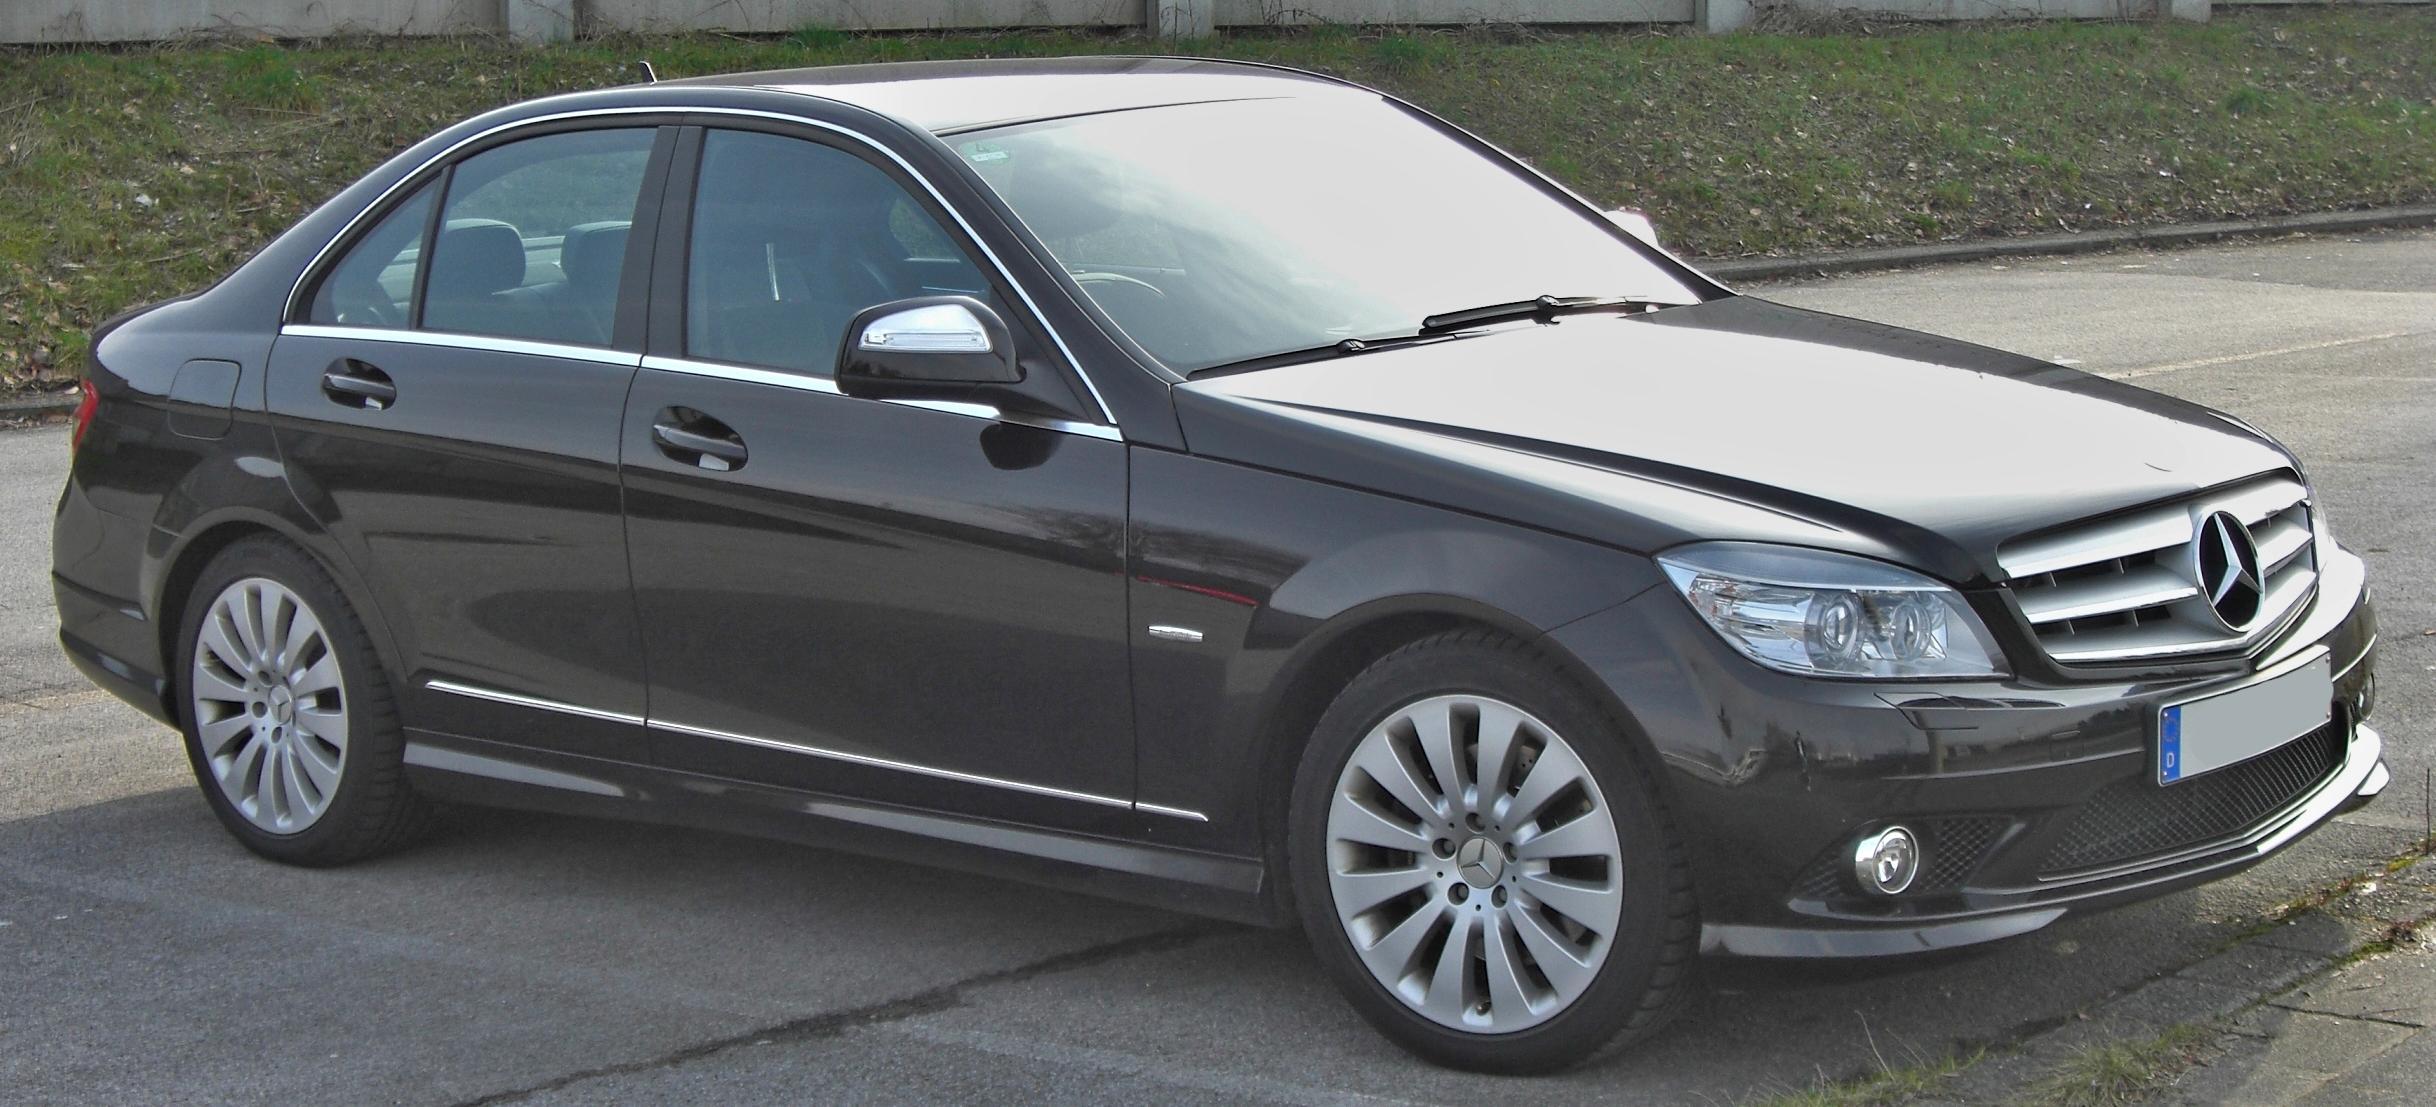 Mercedes A Klasse Brems Hydraulik Ef Bf Bdl Verliert